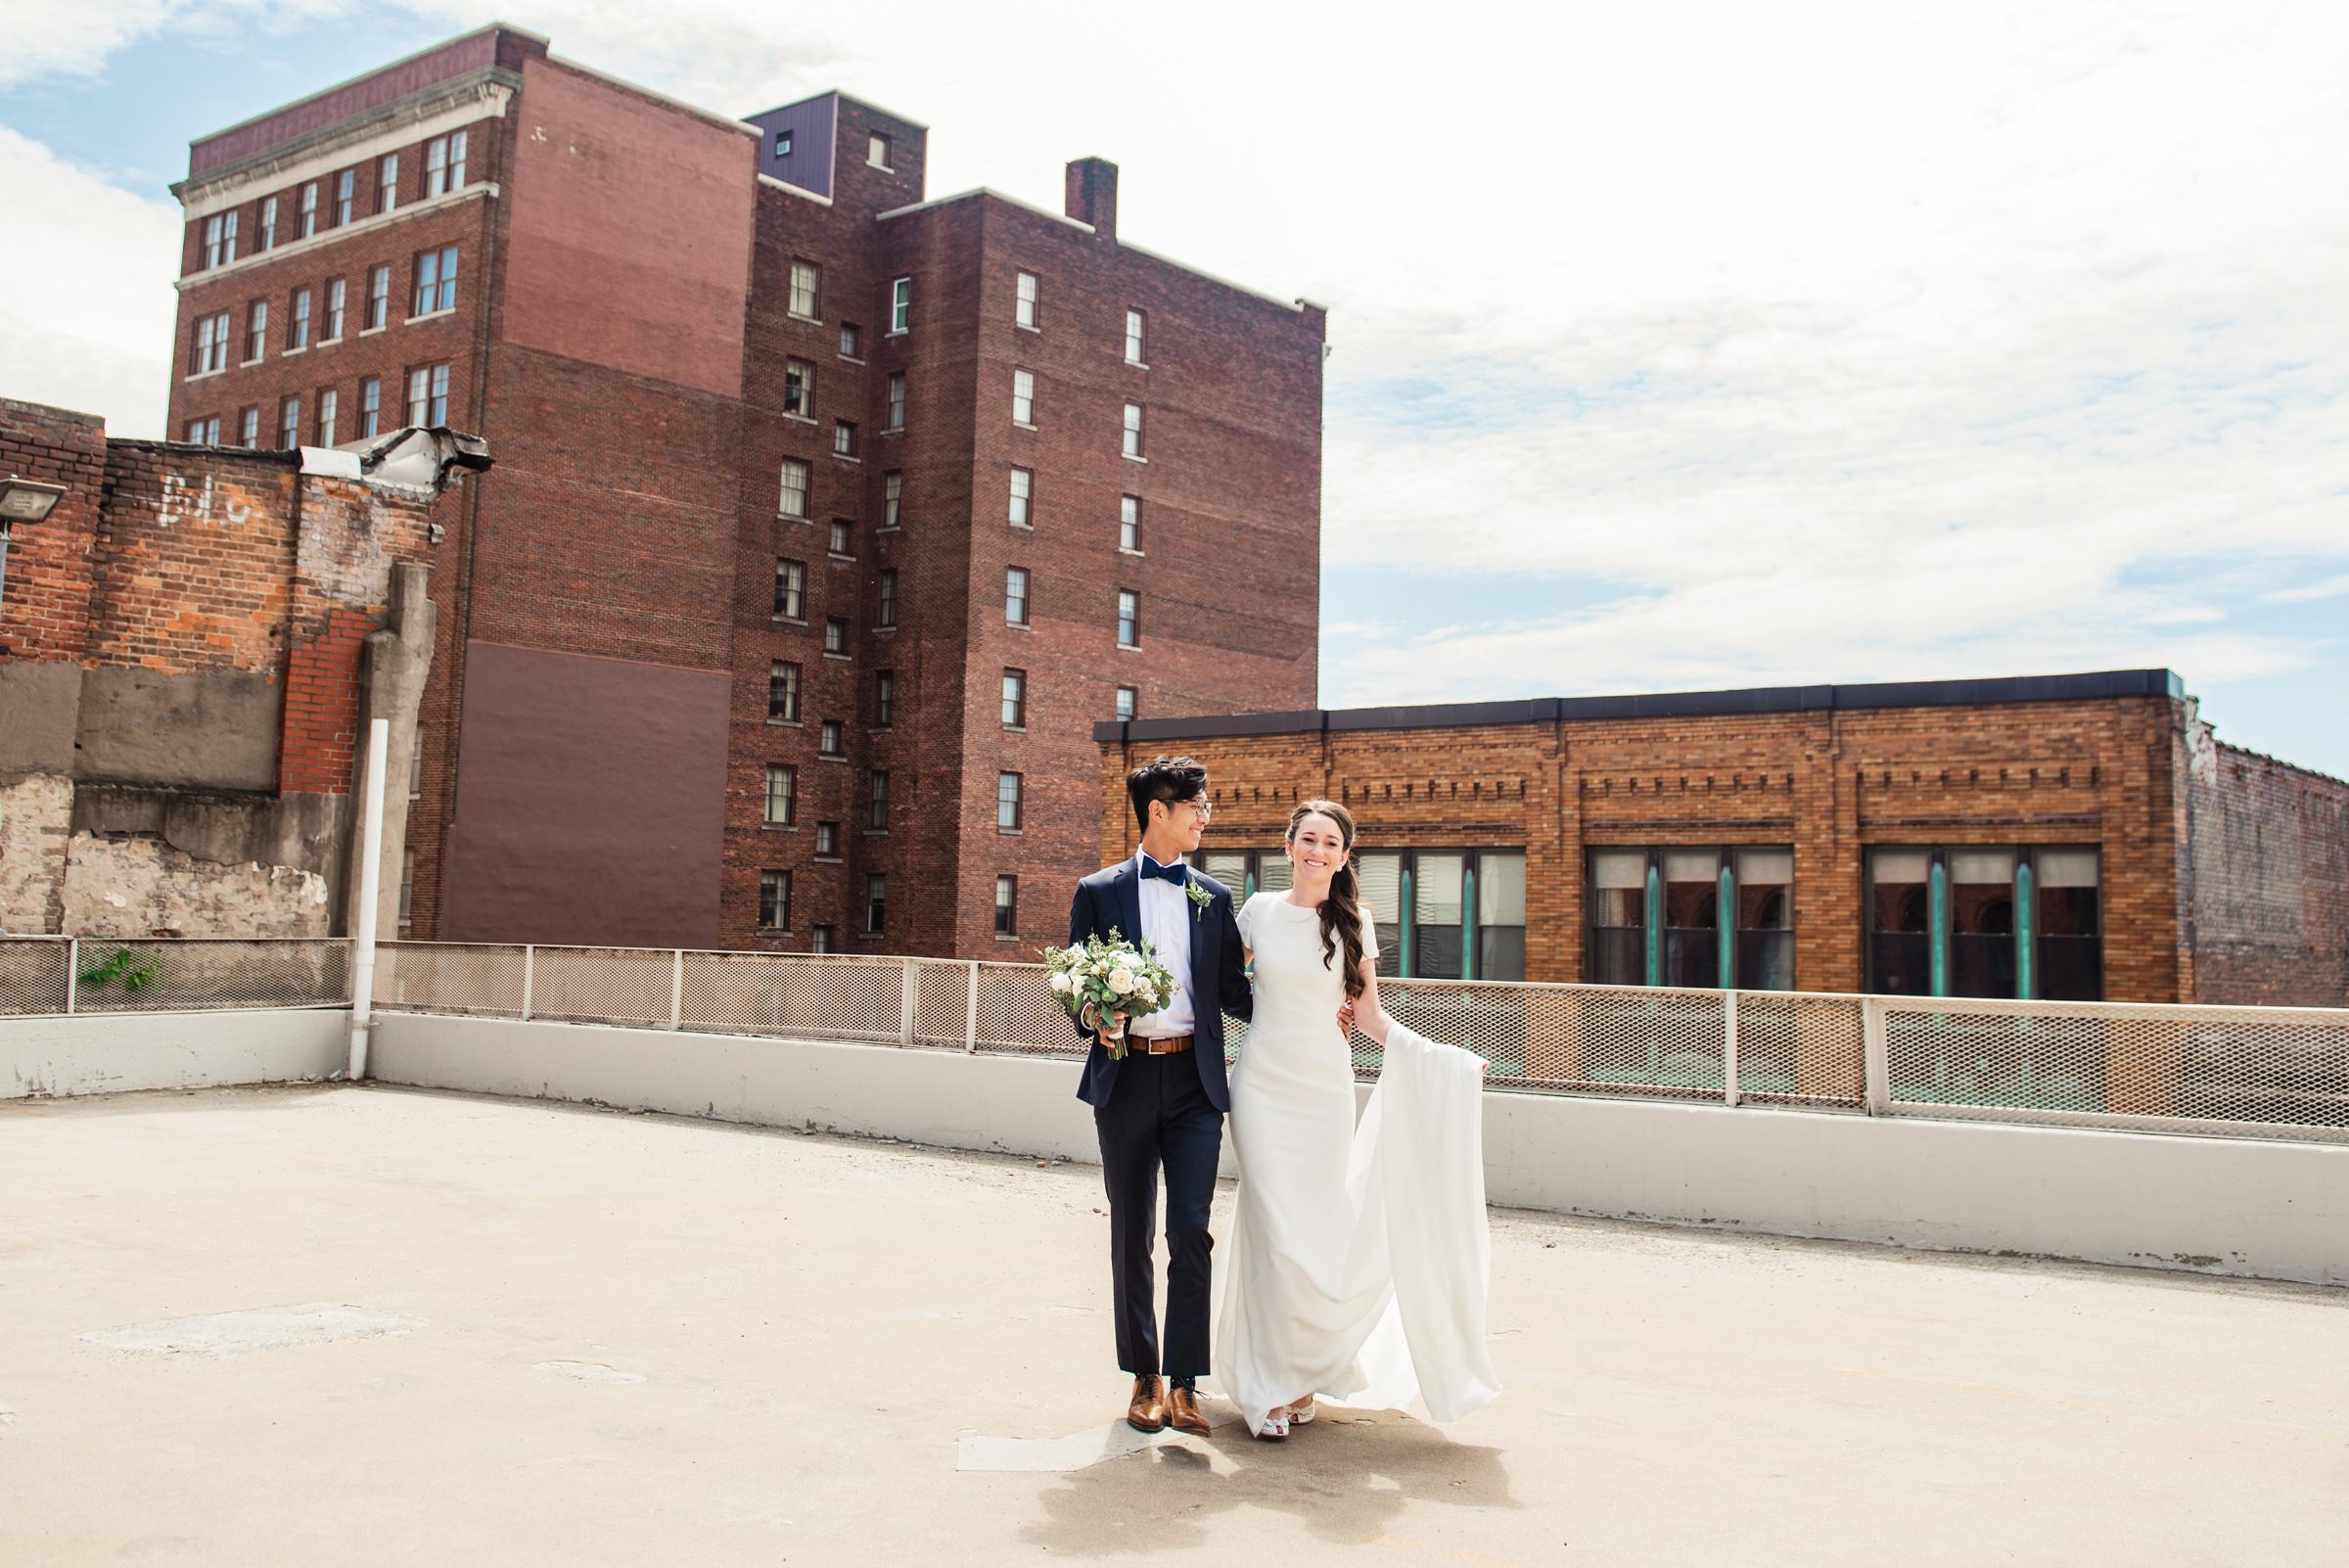 SKY_Armory_Syracuse_Wedding_JILL_STUDIO_Rochester_NY_Photographer_DSC_5275.jpg